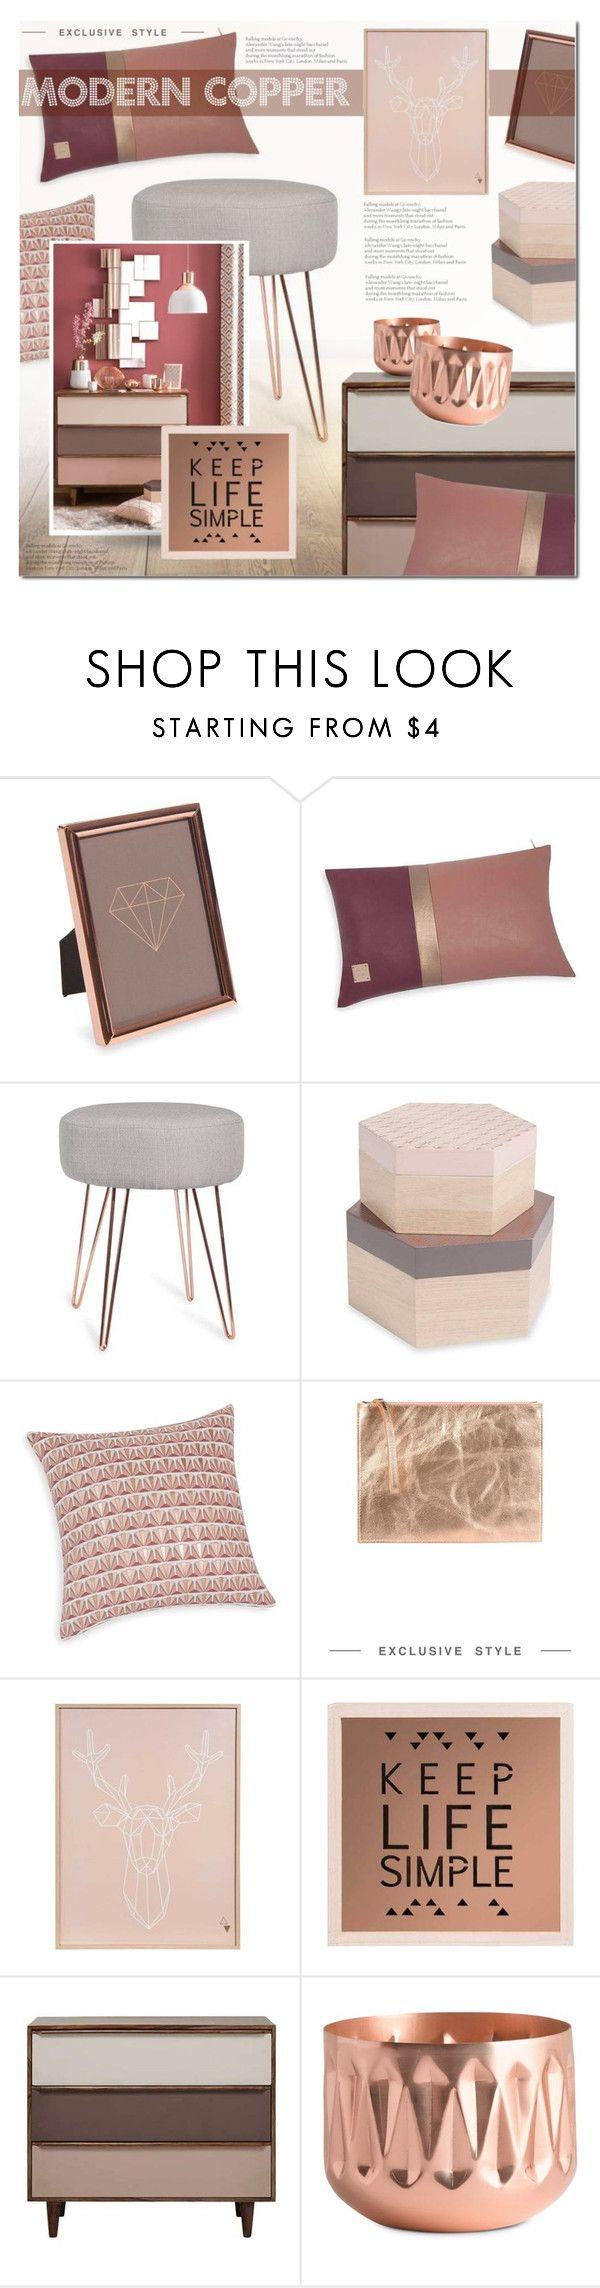 """Modern Copper"" by anna-anica on Polyvore featuring interior, interiors, interior design, home, home decor, interior decorating, George J. Love, ESPRIT, Illume and modern"